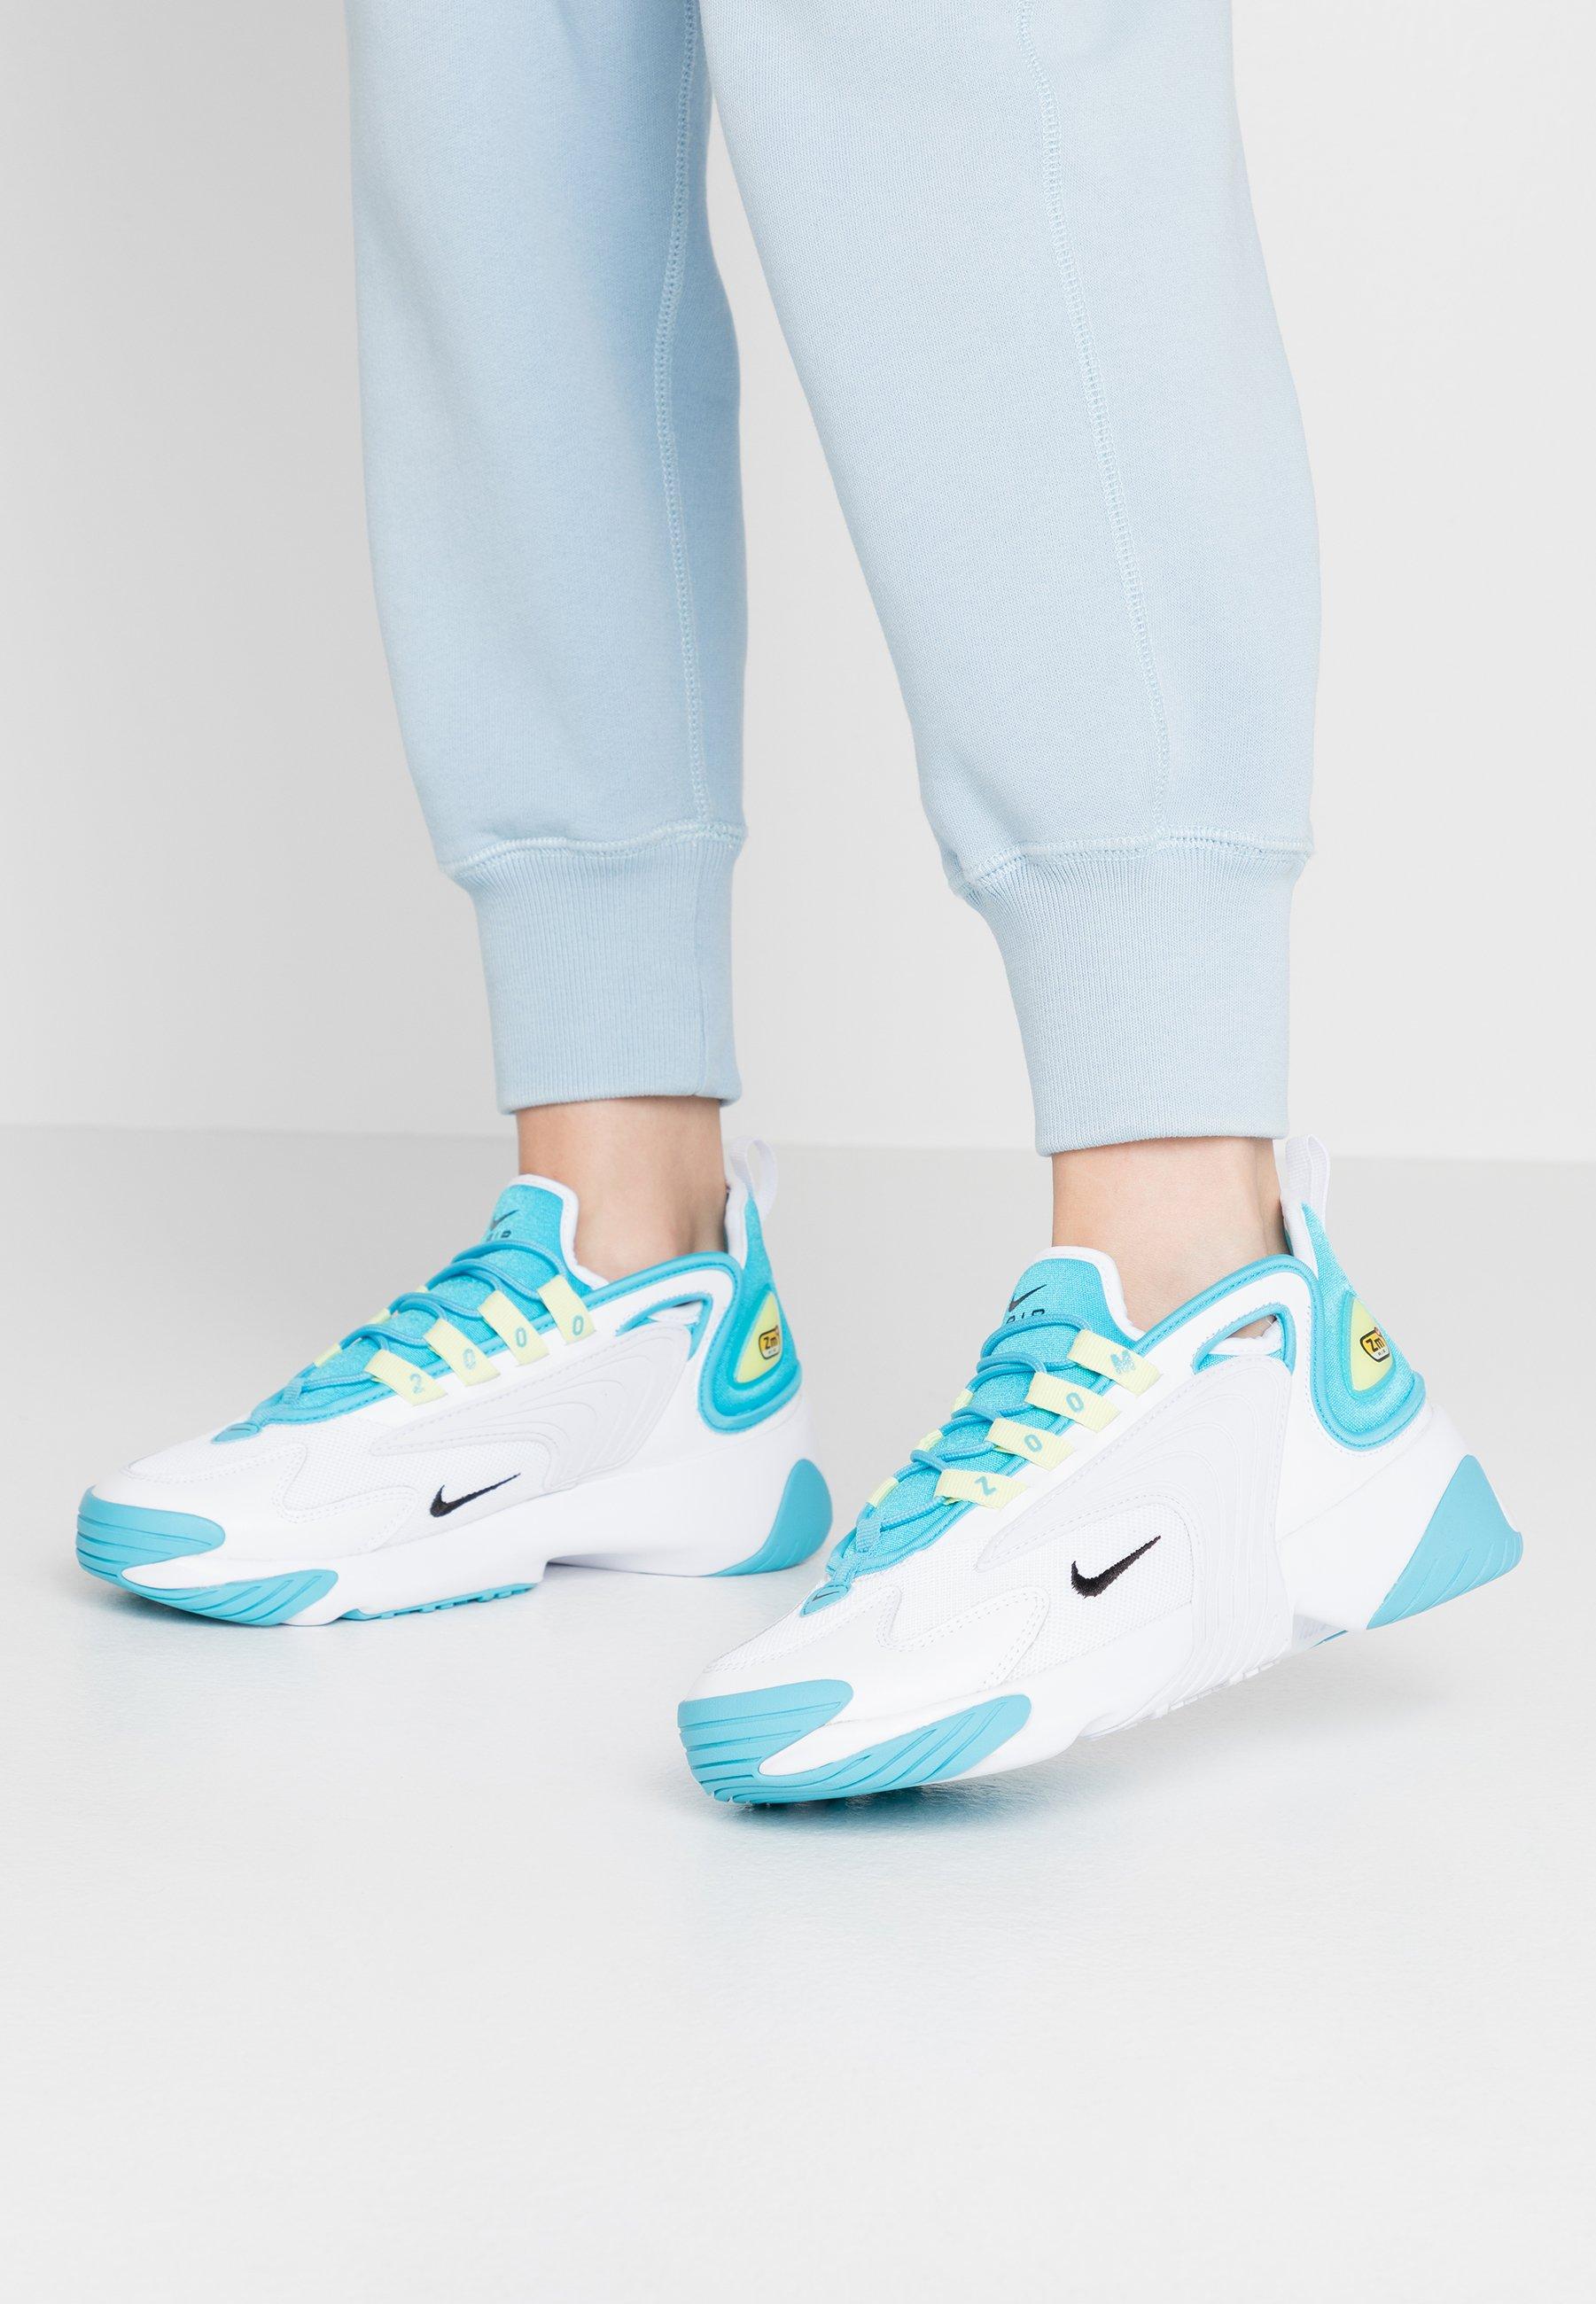 ZOOM 2K Sneakers blue furyblackwhitelimelight